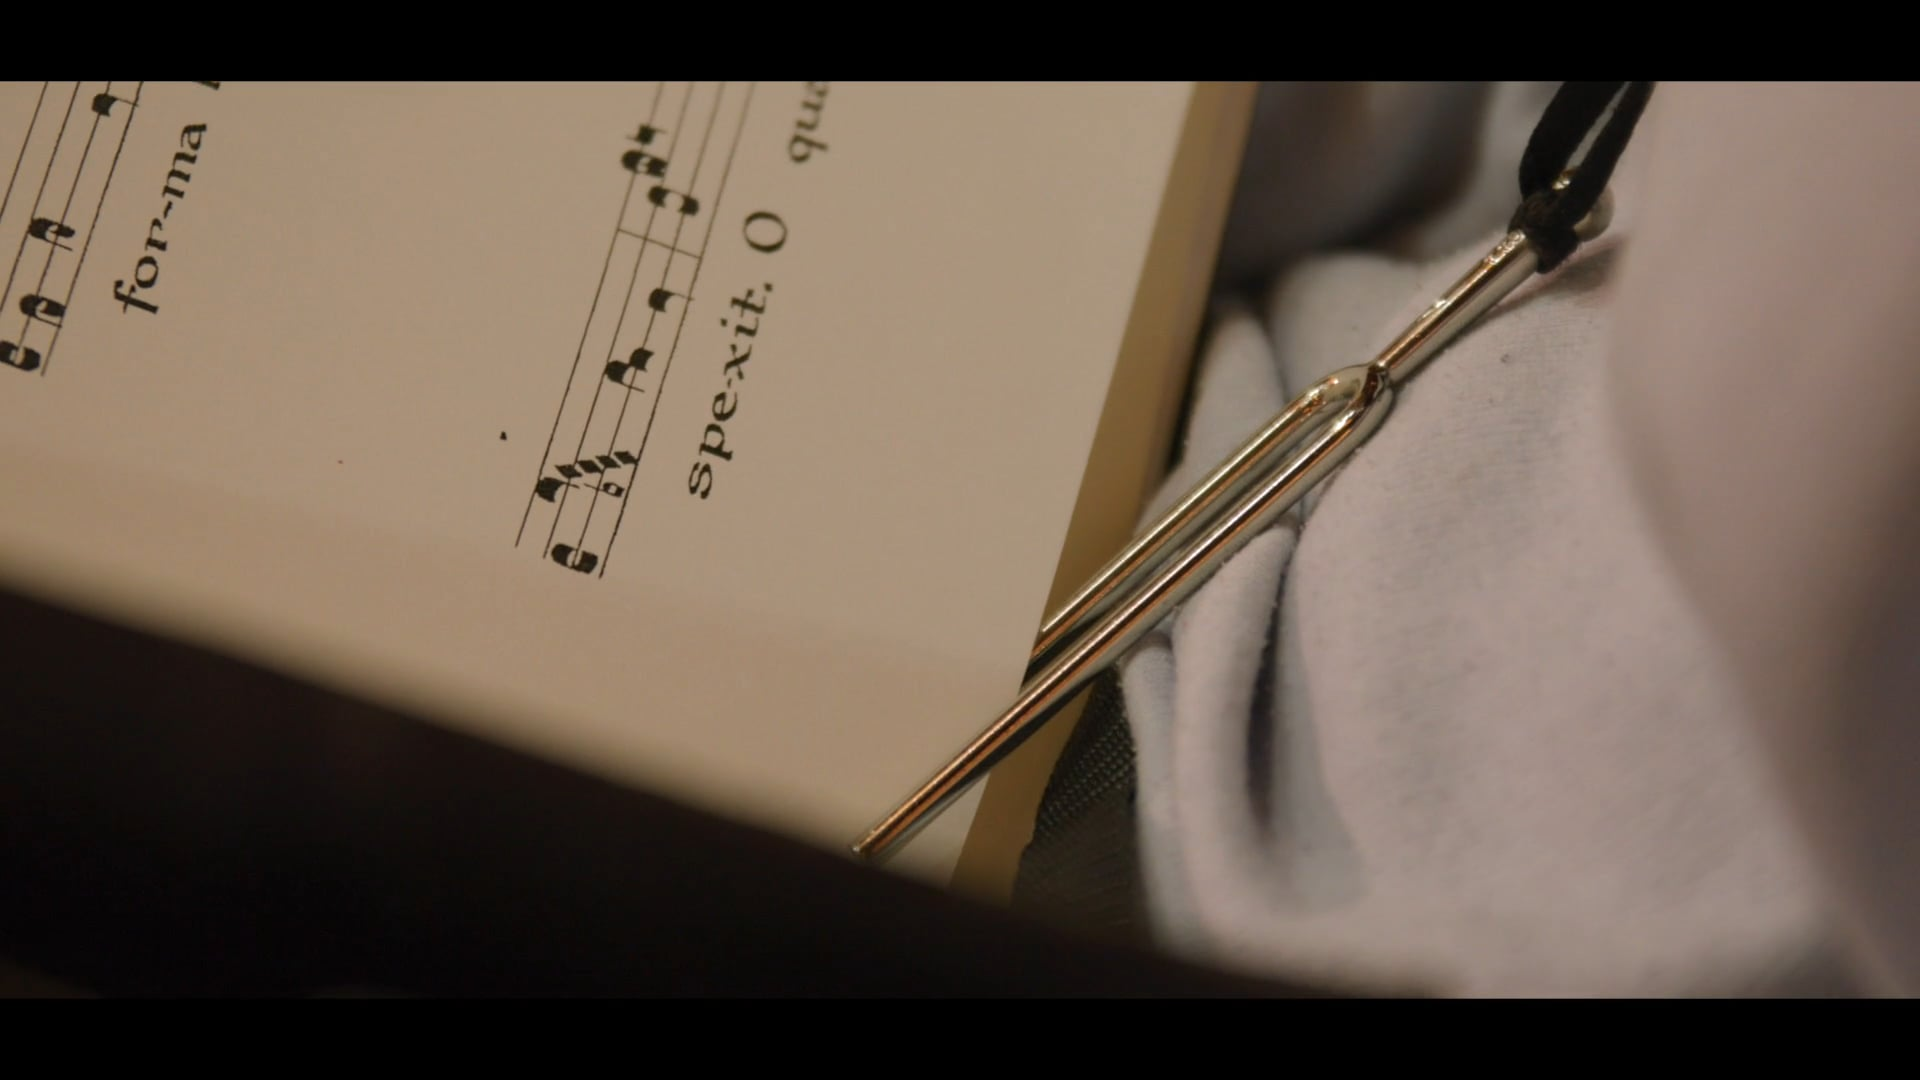 La Maitrise - Radio France - Short version